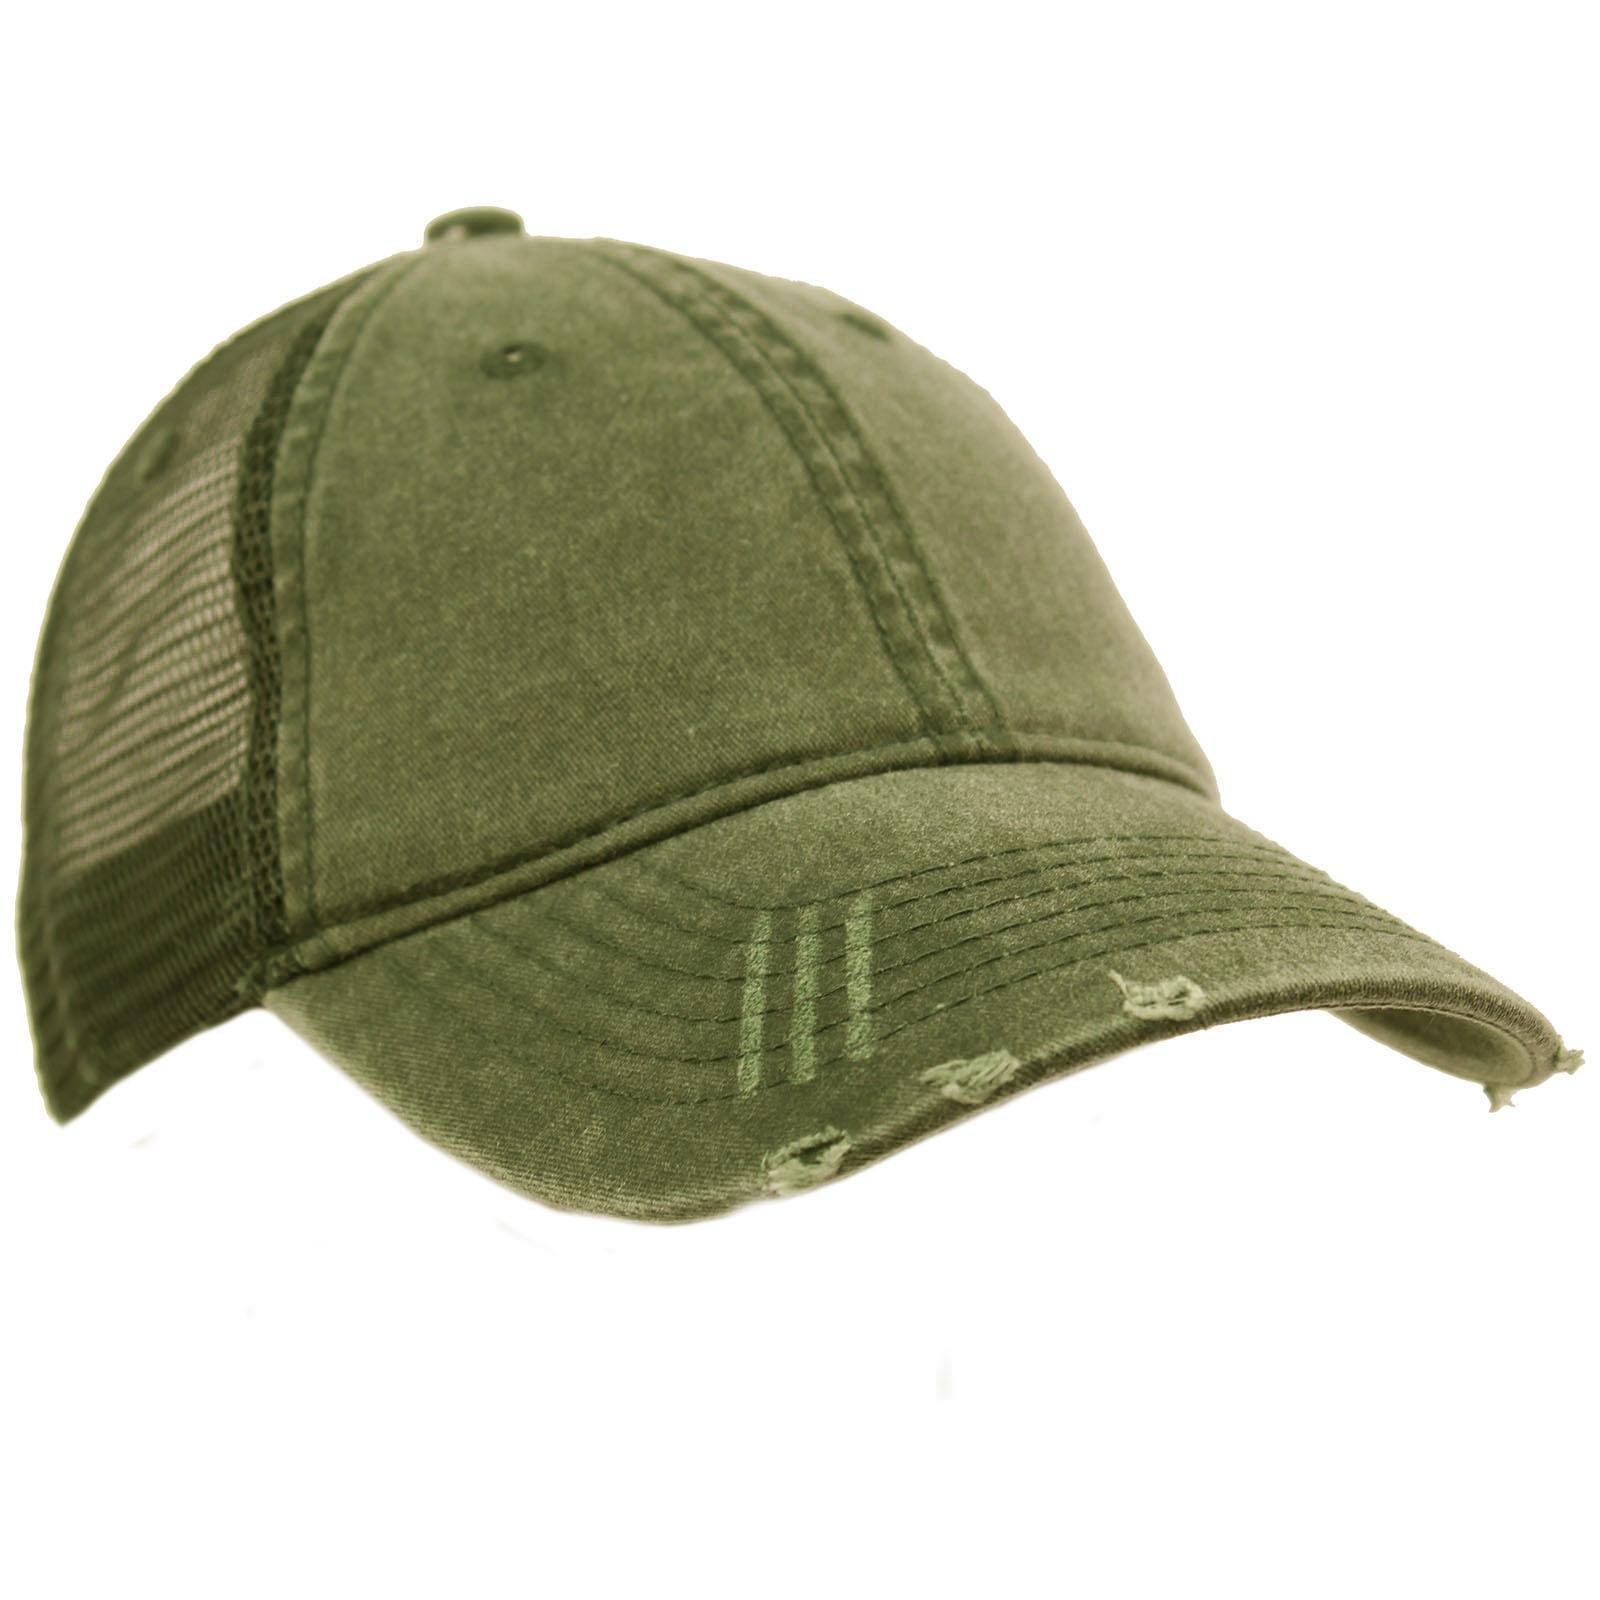 Unisex Distressed Low Profile Trucker Mesh Summer Baseball Sun Cap Hat Olive